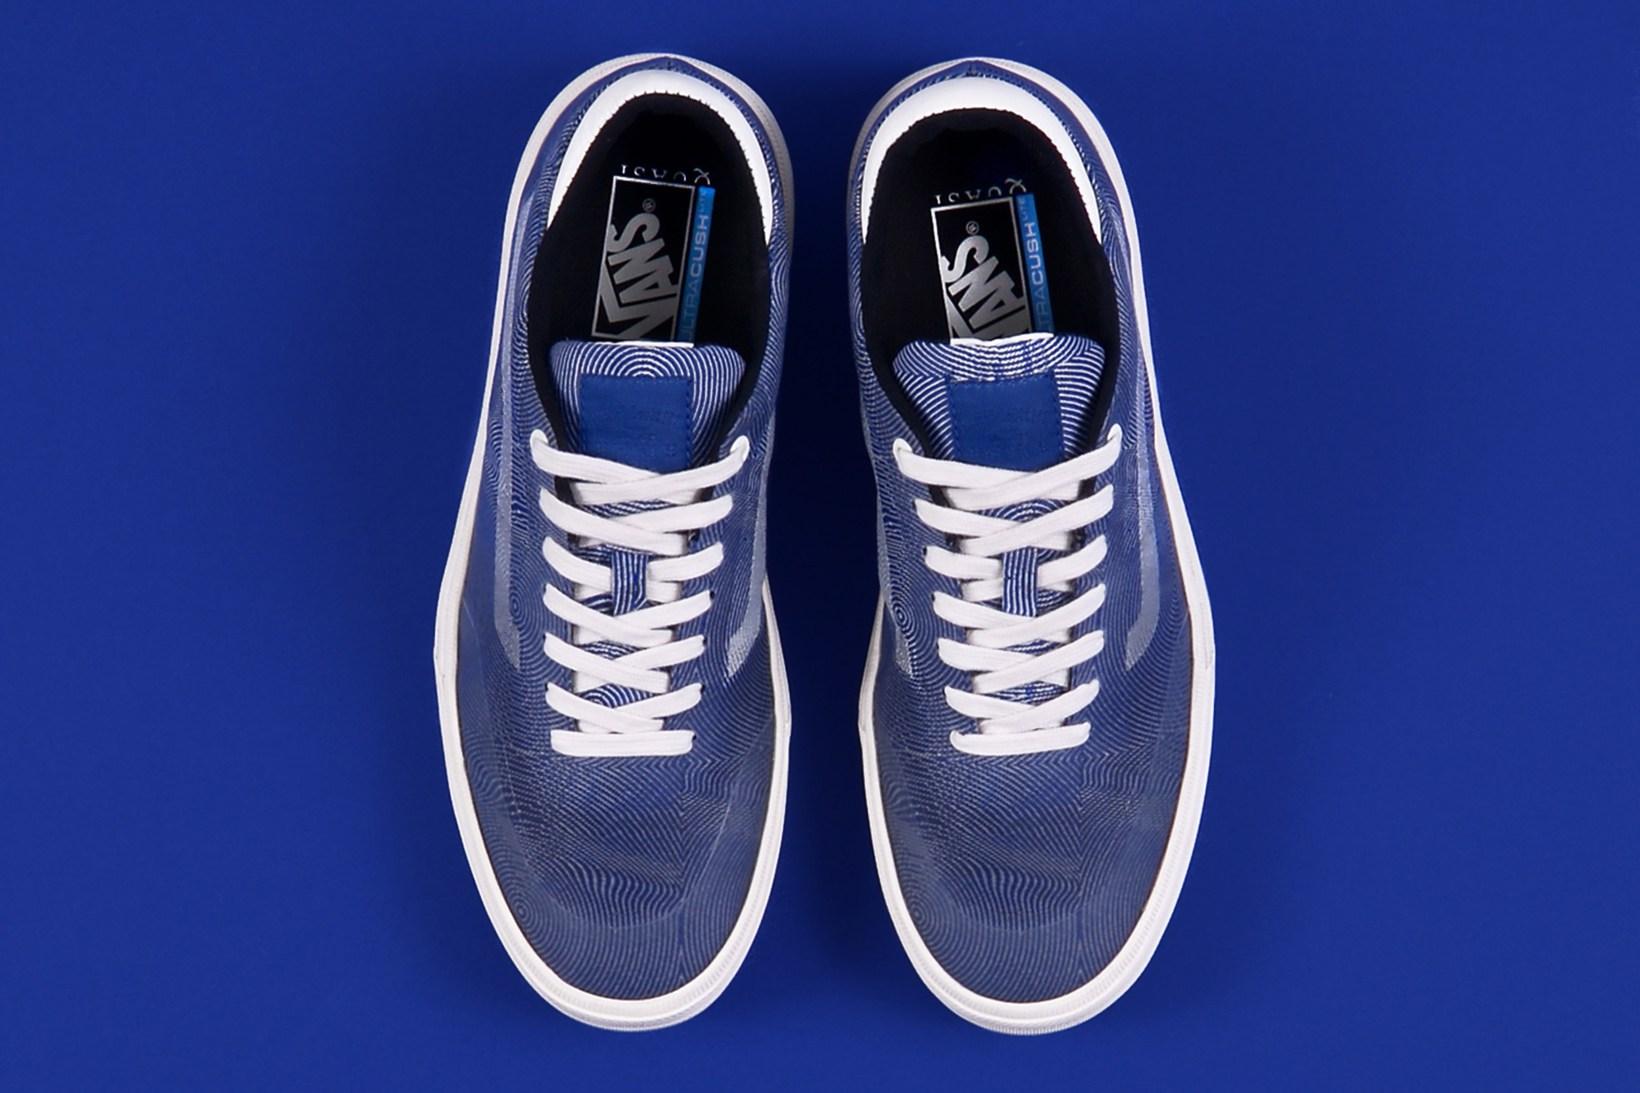 vans-pro-skate-arcad-gilbert-crockett-quasi-skateboards-6